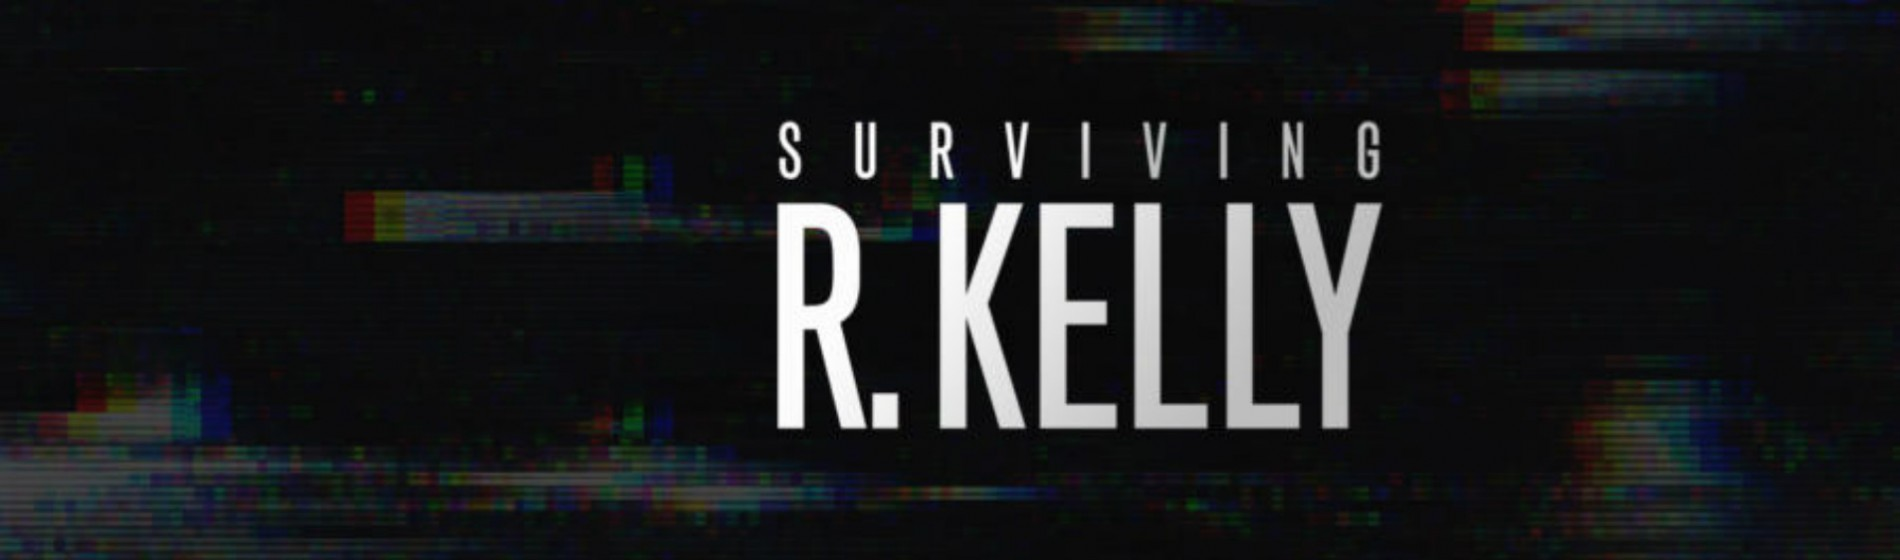 surviving-r-kelly-title